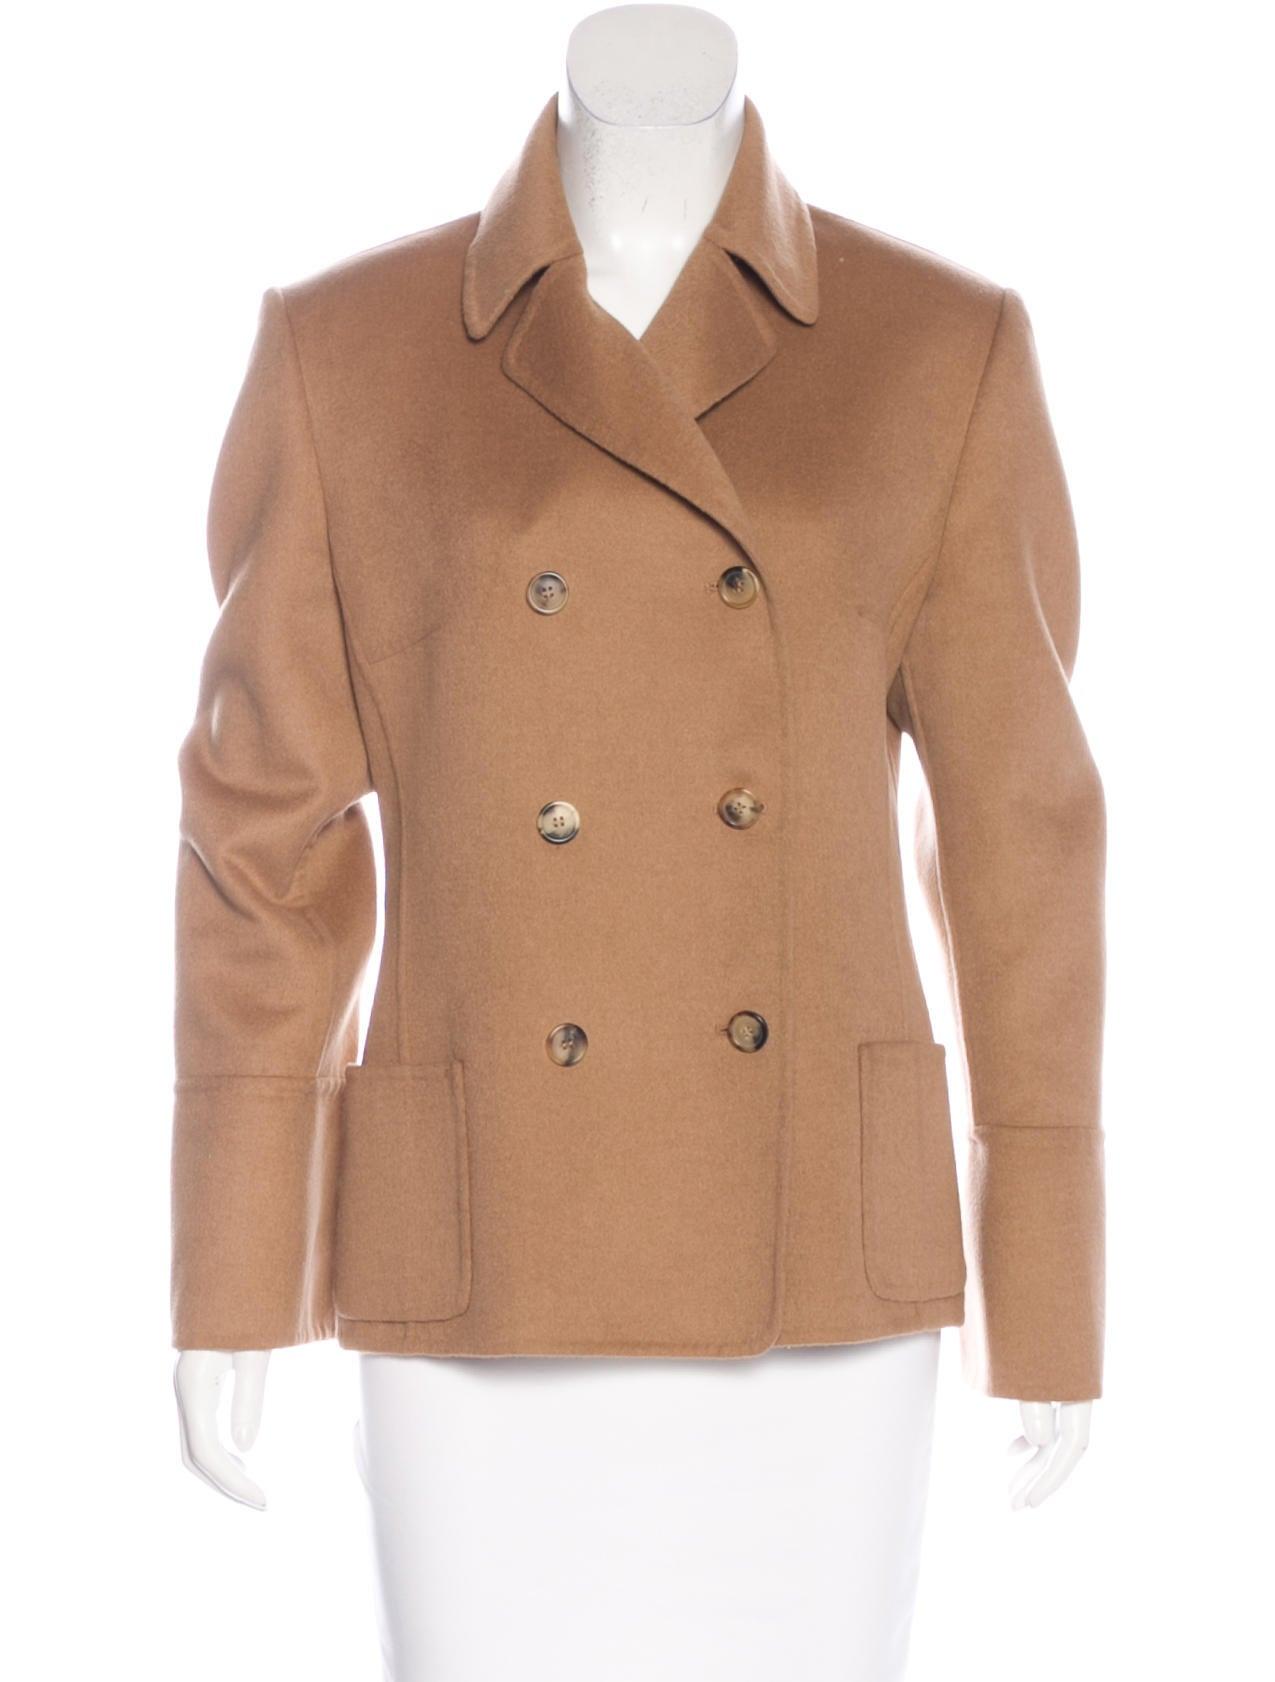 Cool Womens White Pea Coat Jackets - Tradingbasis